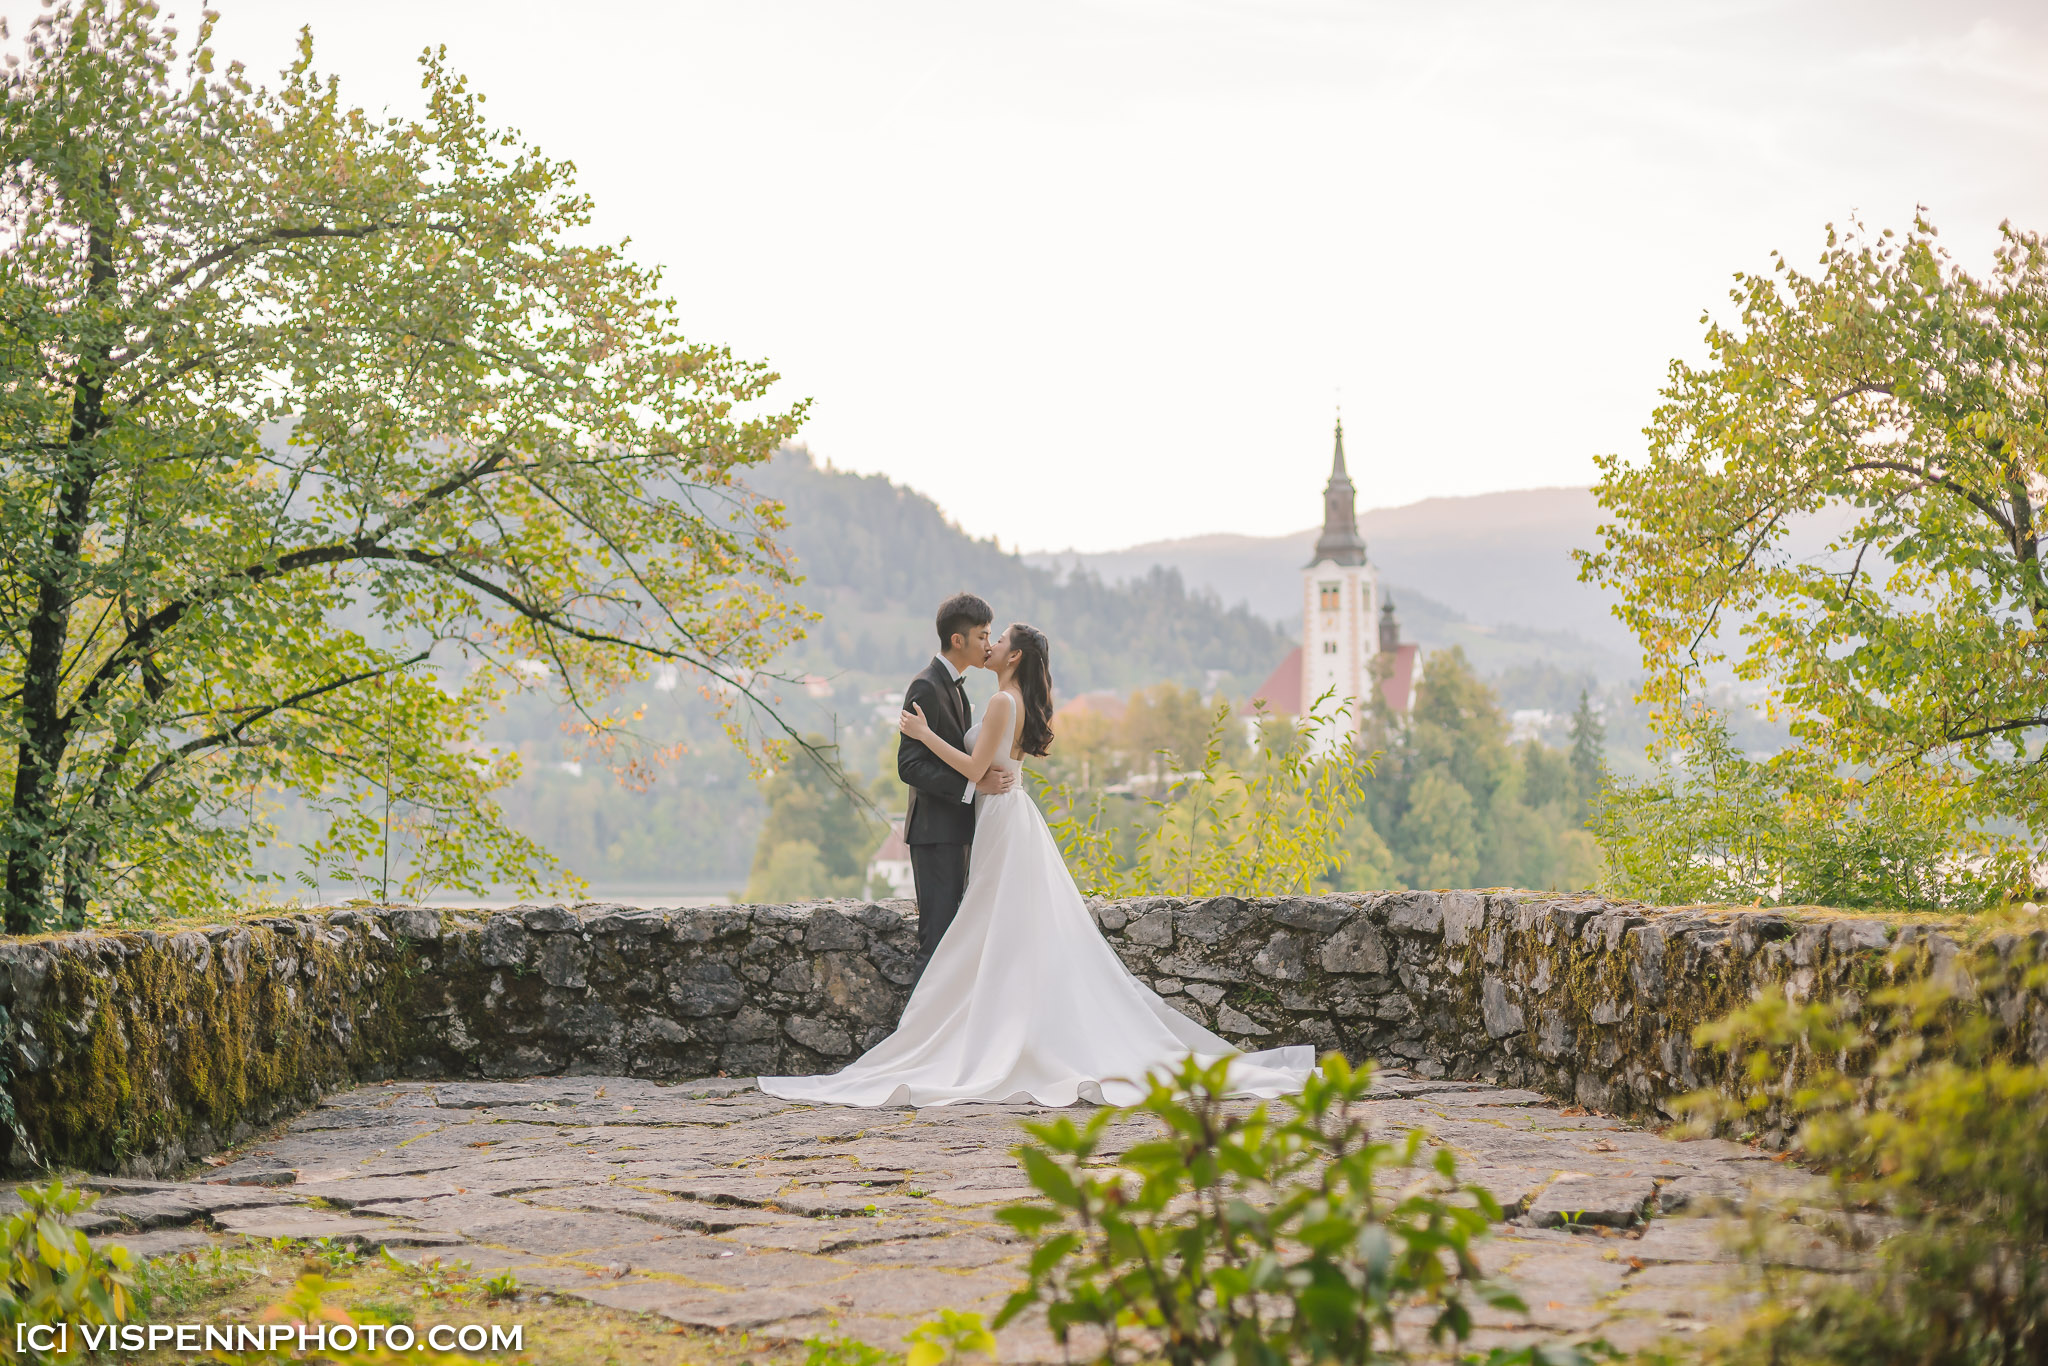 PRE WEDDING Photography Melbourne VISPENN 墨尔本 婚纱照 结婚照 婚纱摄影 DSC02915